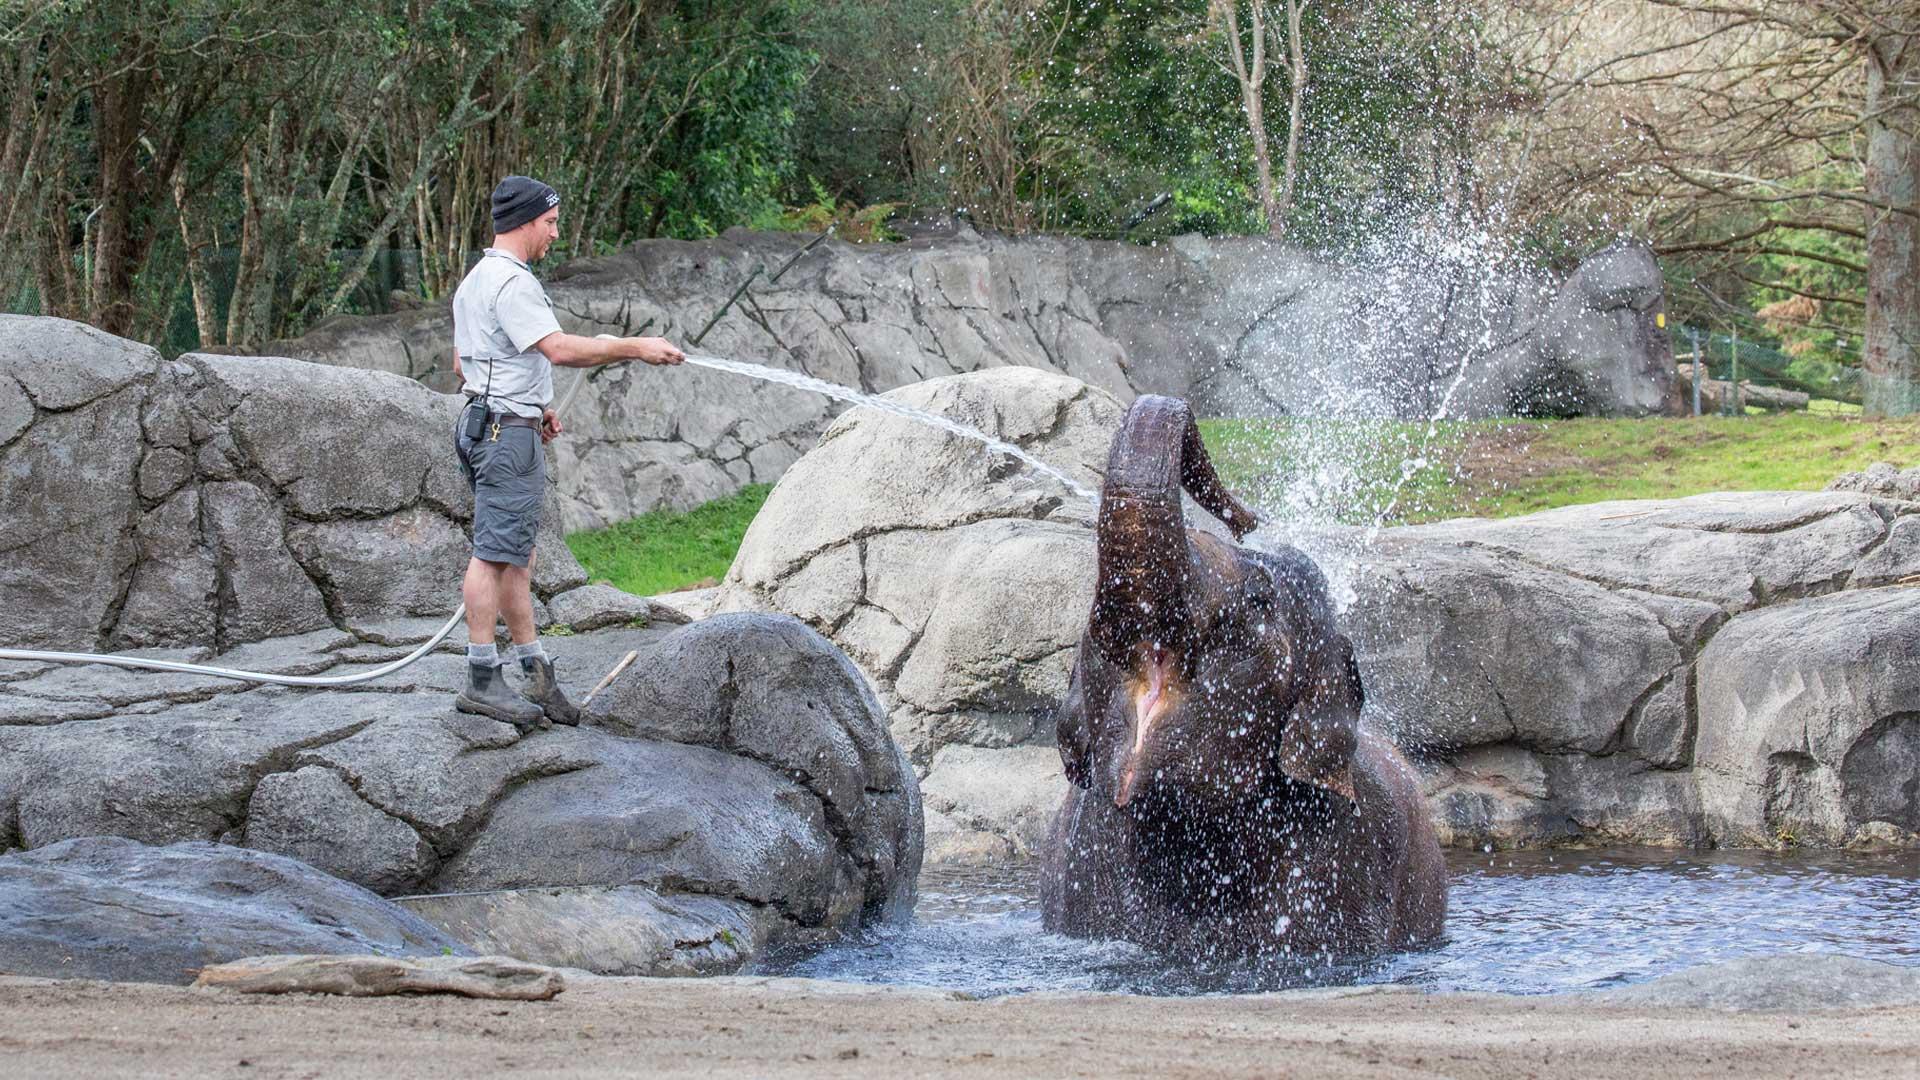 https://rfacdn.nz/zoo/assets/media/elephant-water-gallery-2.jpg